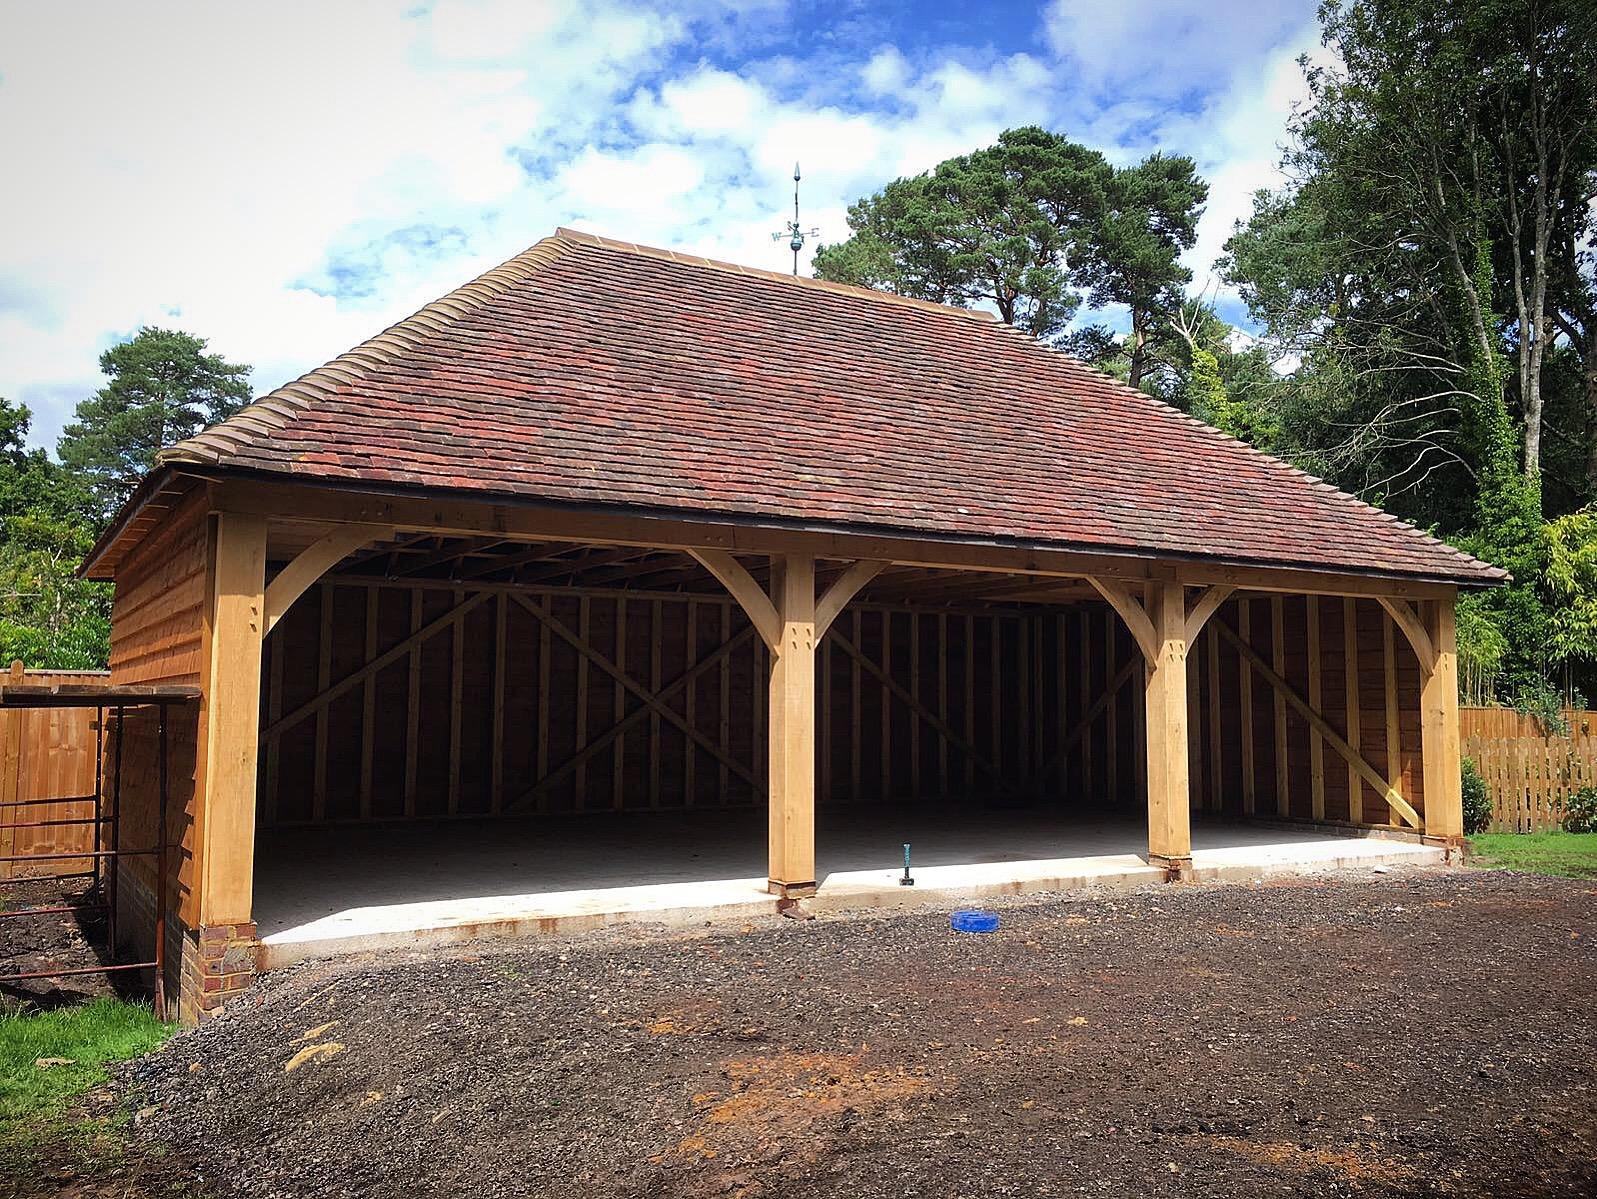 Shed Roof Timber Frame Carport Carport Ideas